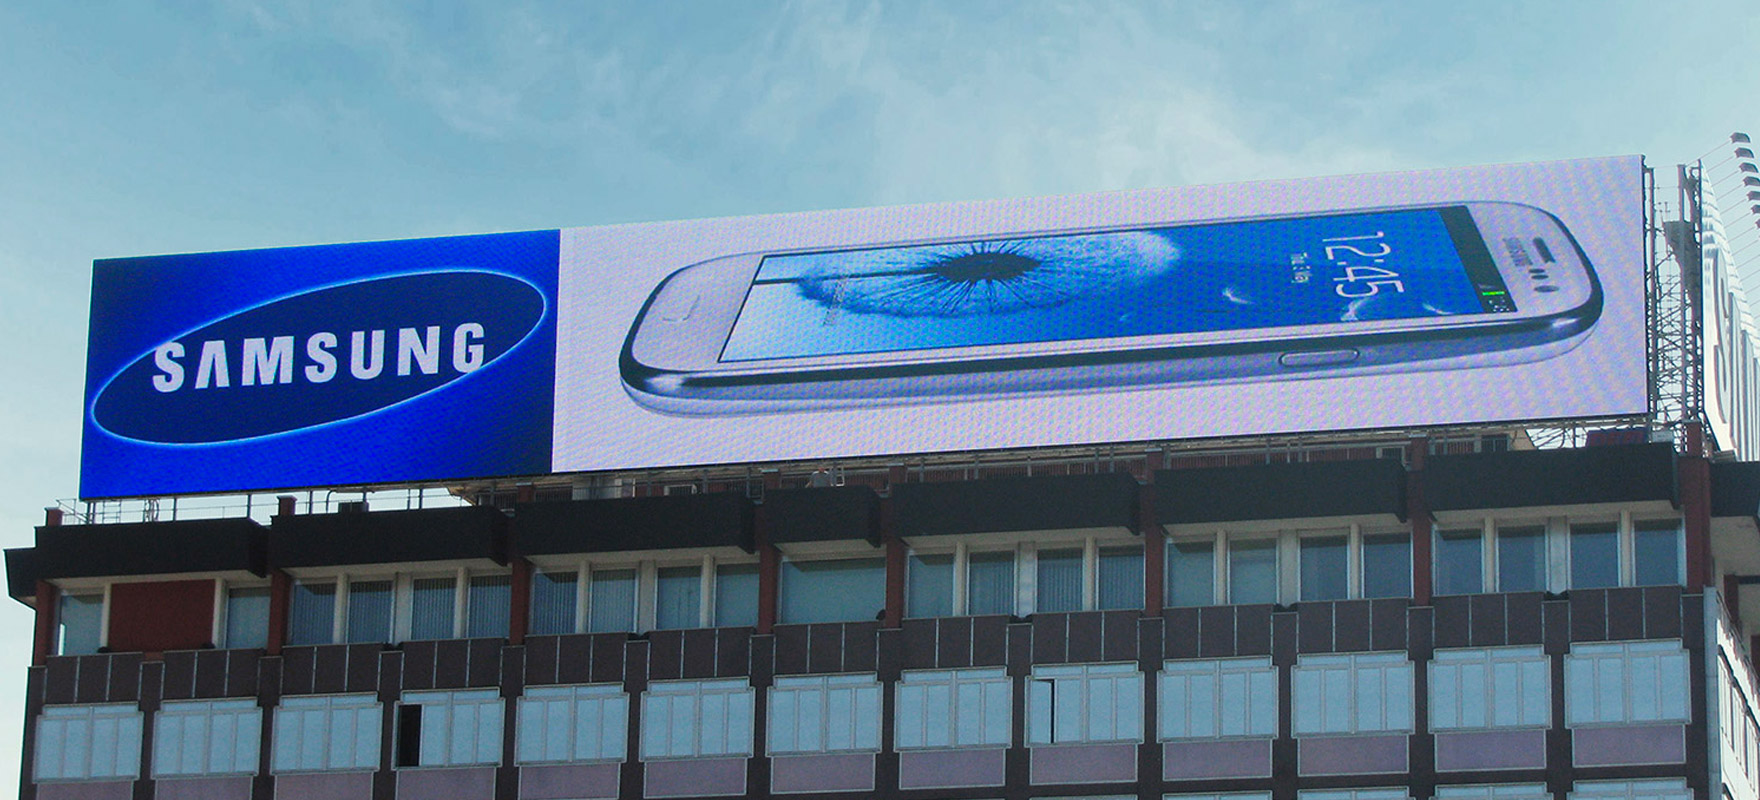 Maxi ledwall su tetto digital billboard affissione LED on the roof